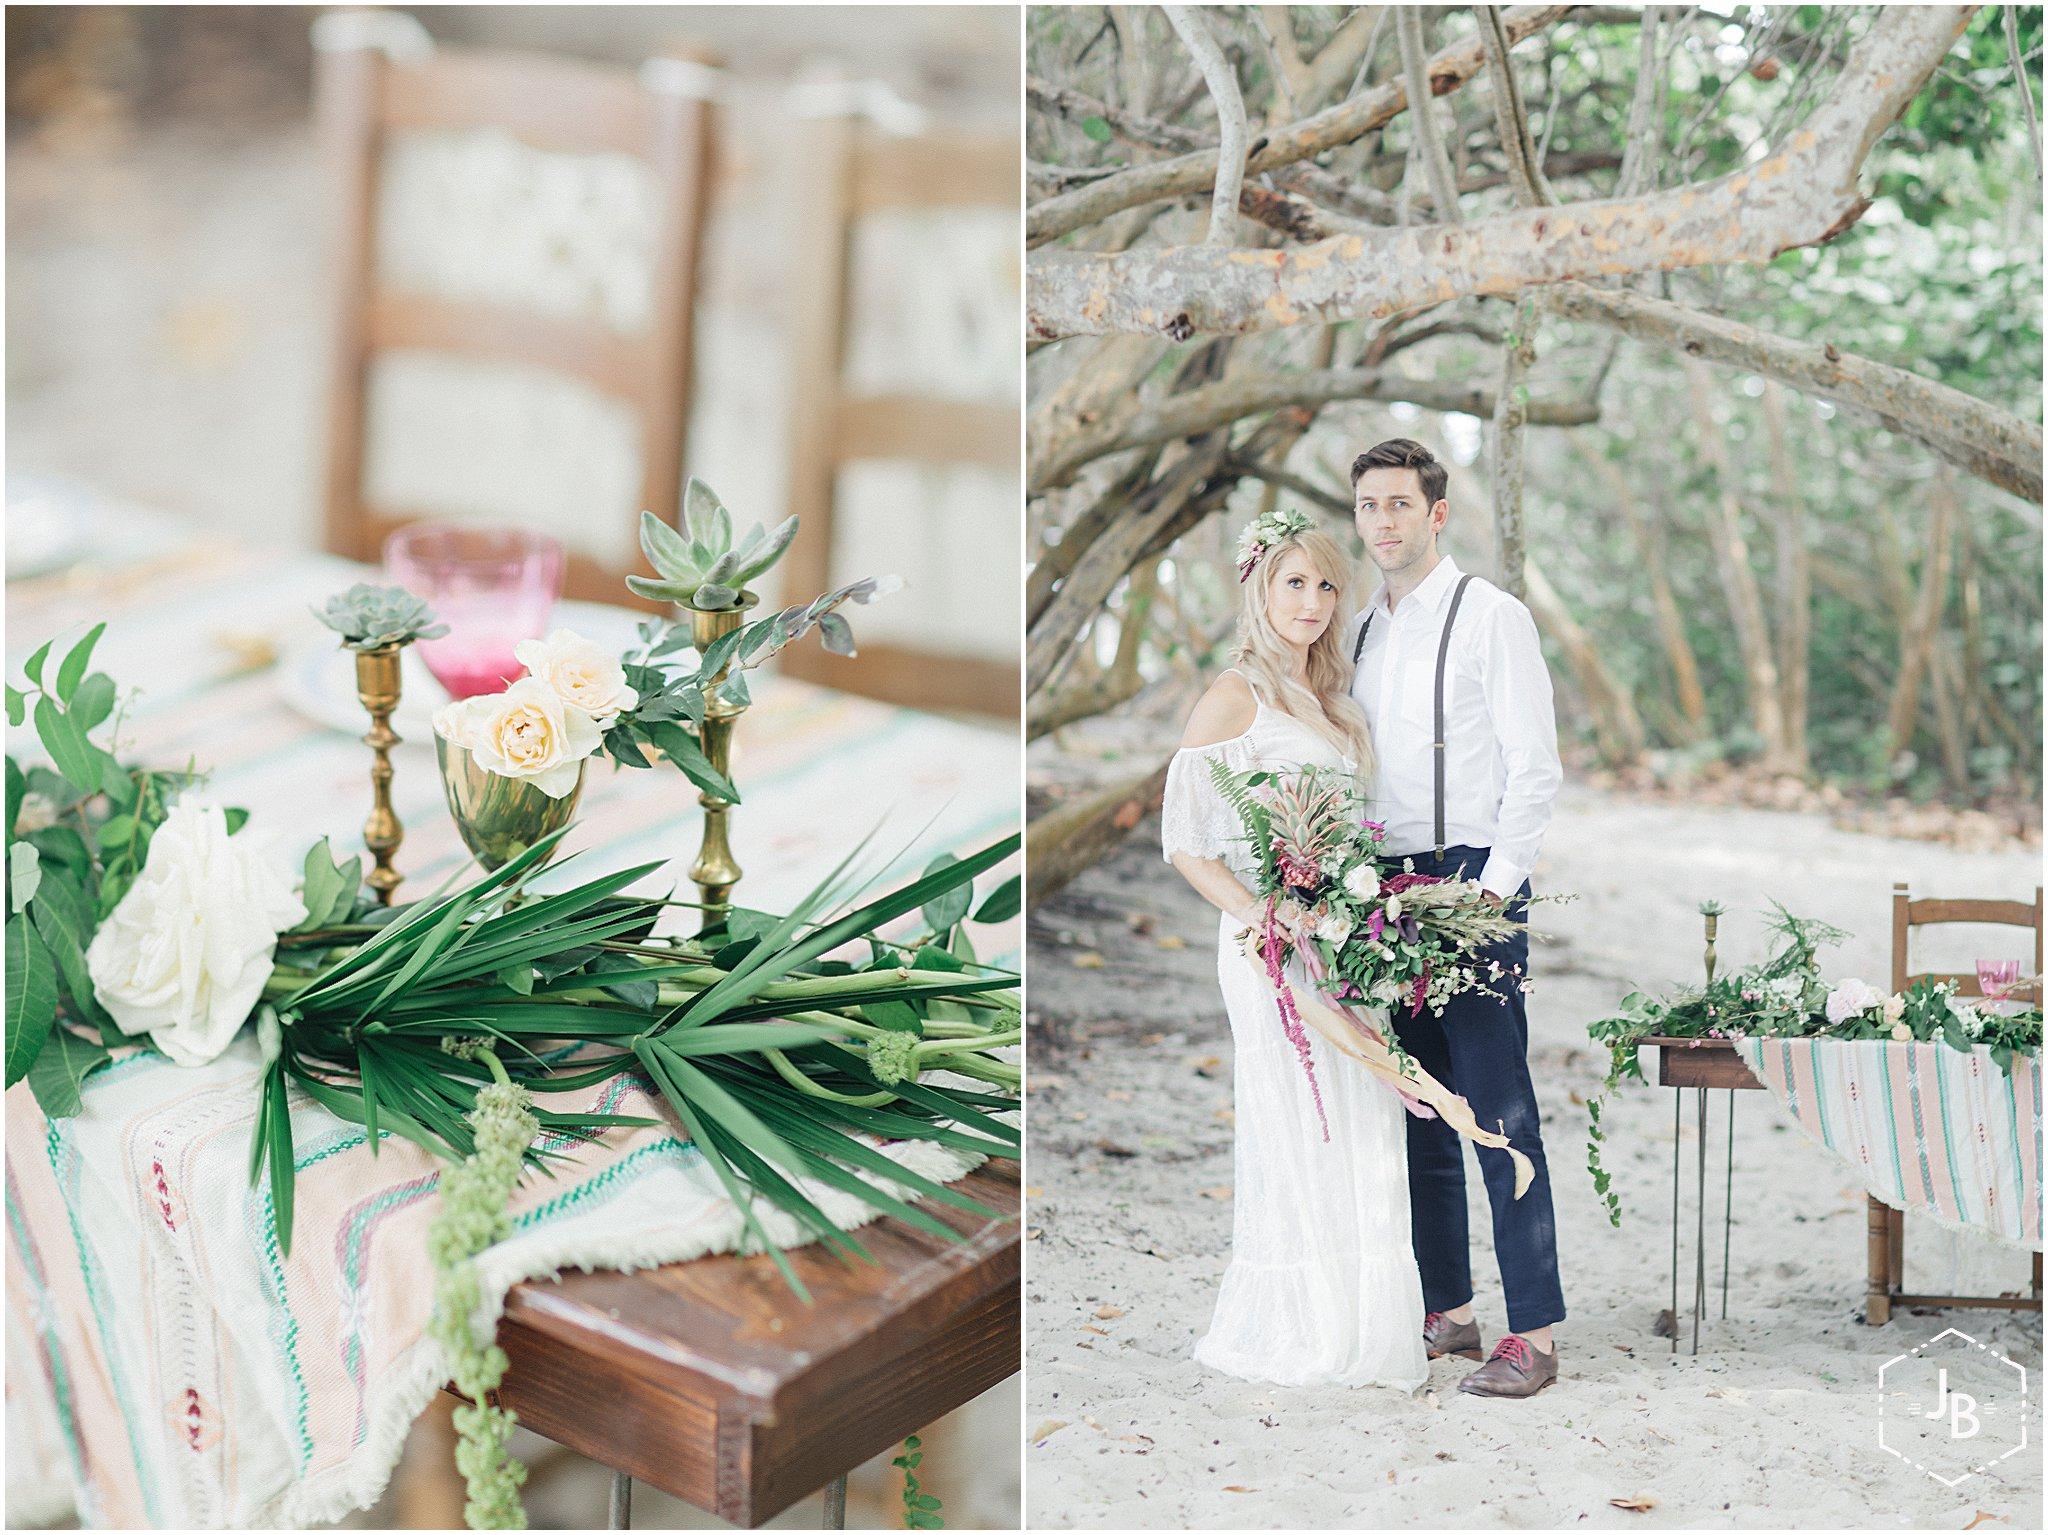 WeddingandEngagementFloridaPhotographer_1346.jpg